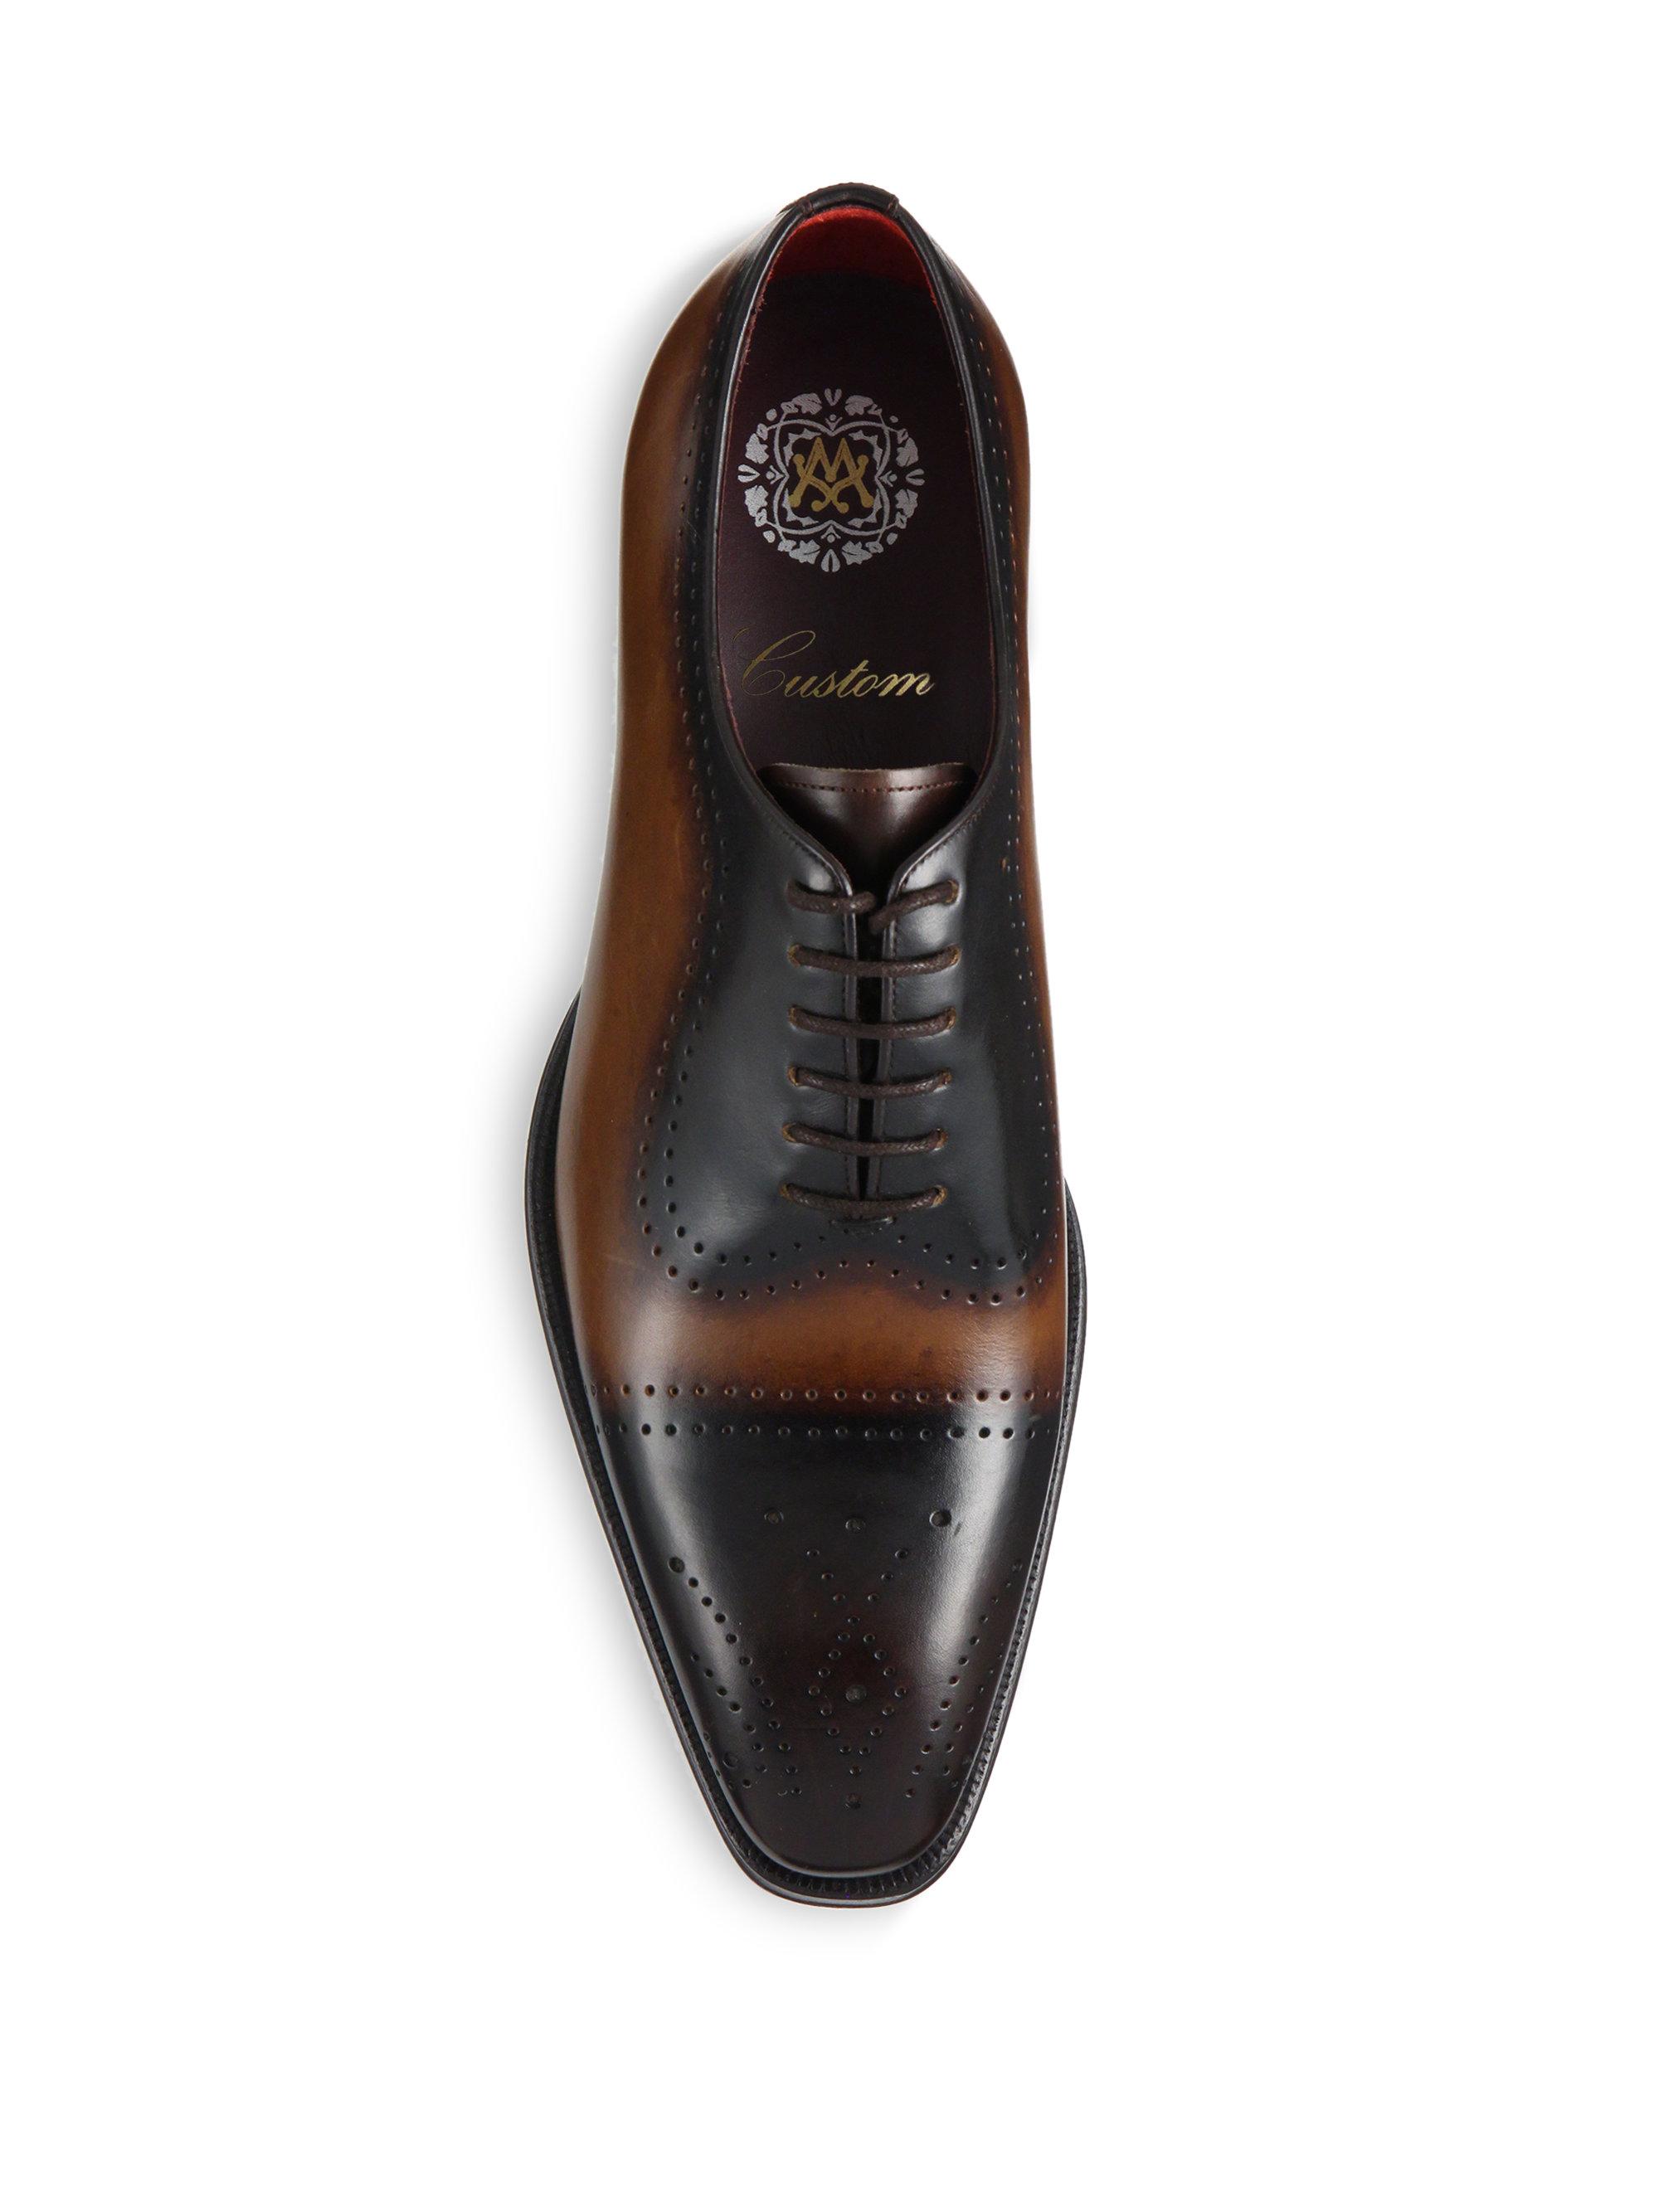 Lyst Mezlan Paolino Leather Derby Shoes In Black For Men